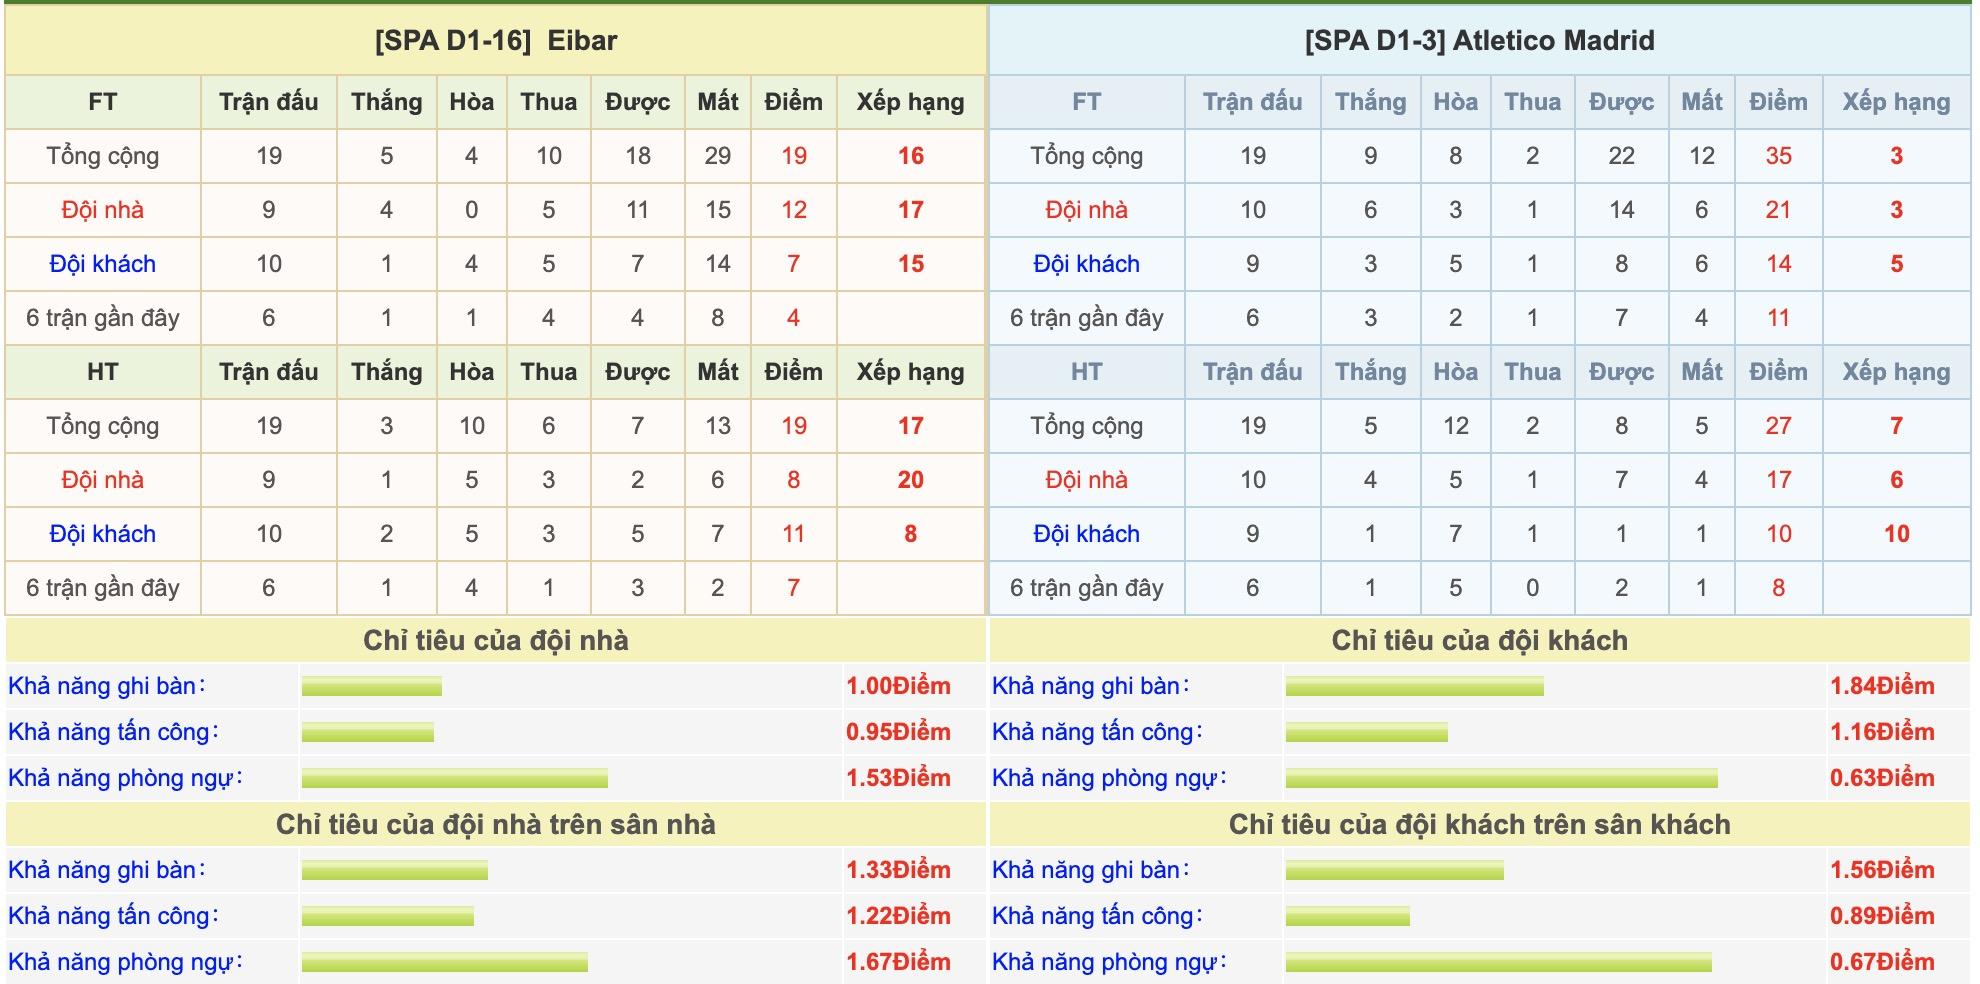 Eibar-vs-Atletico Madrid-soi-keo-vdqg-italia-13-01-ba-dam-meu-mao-6